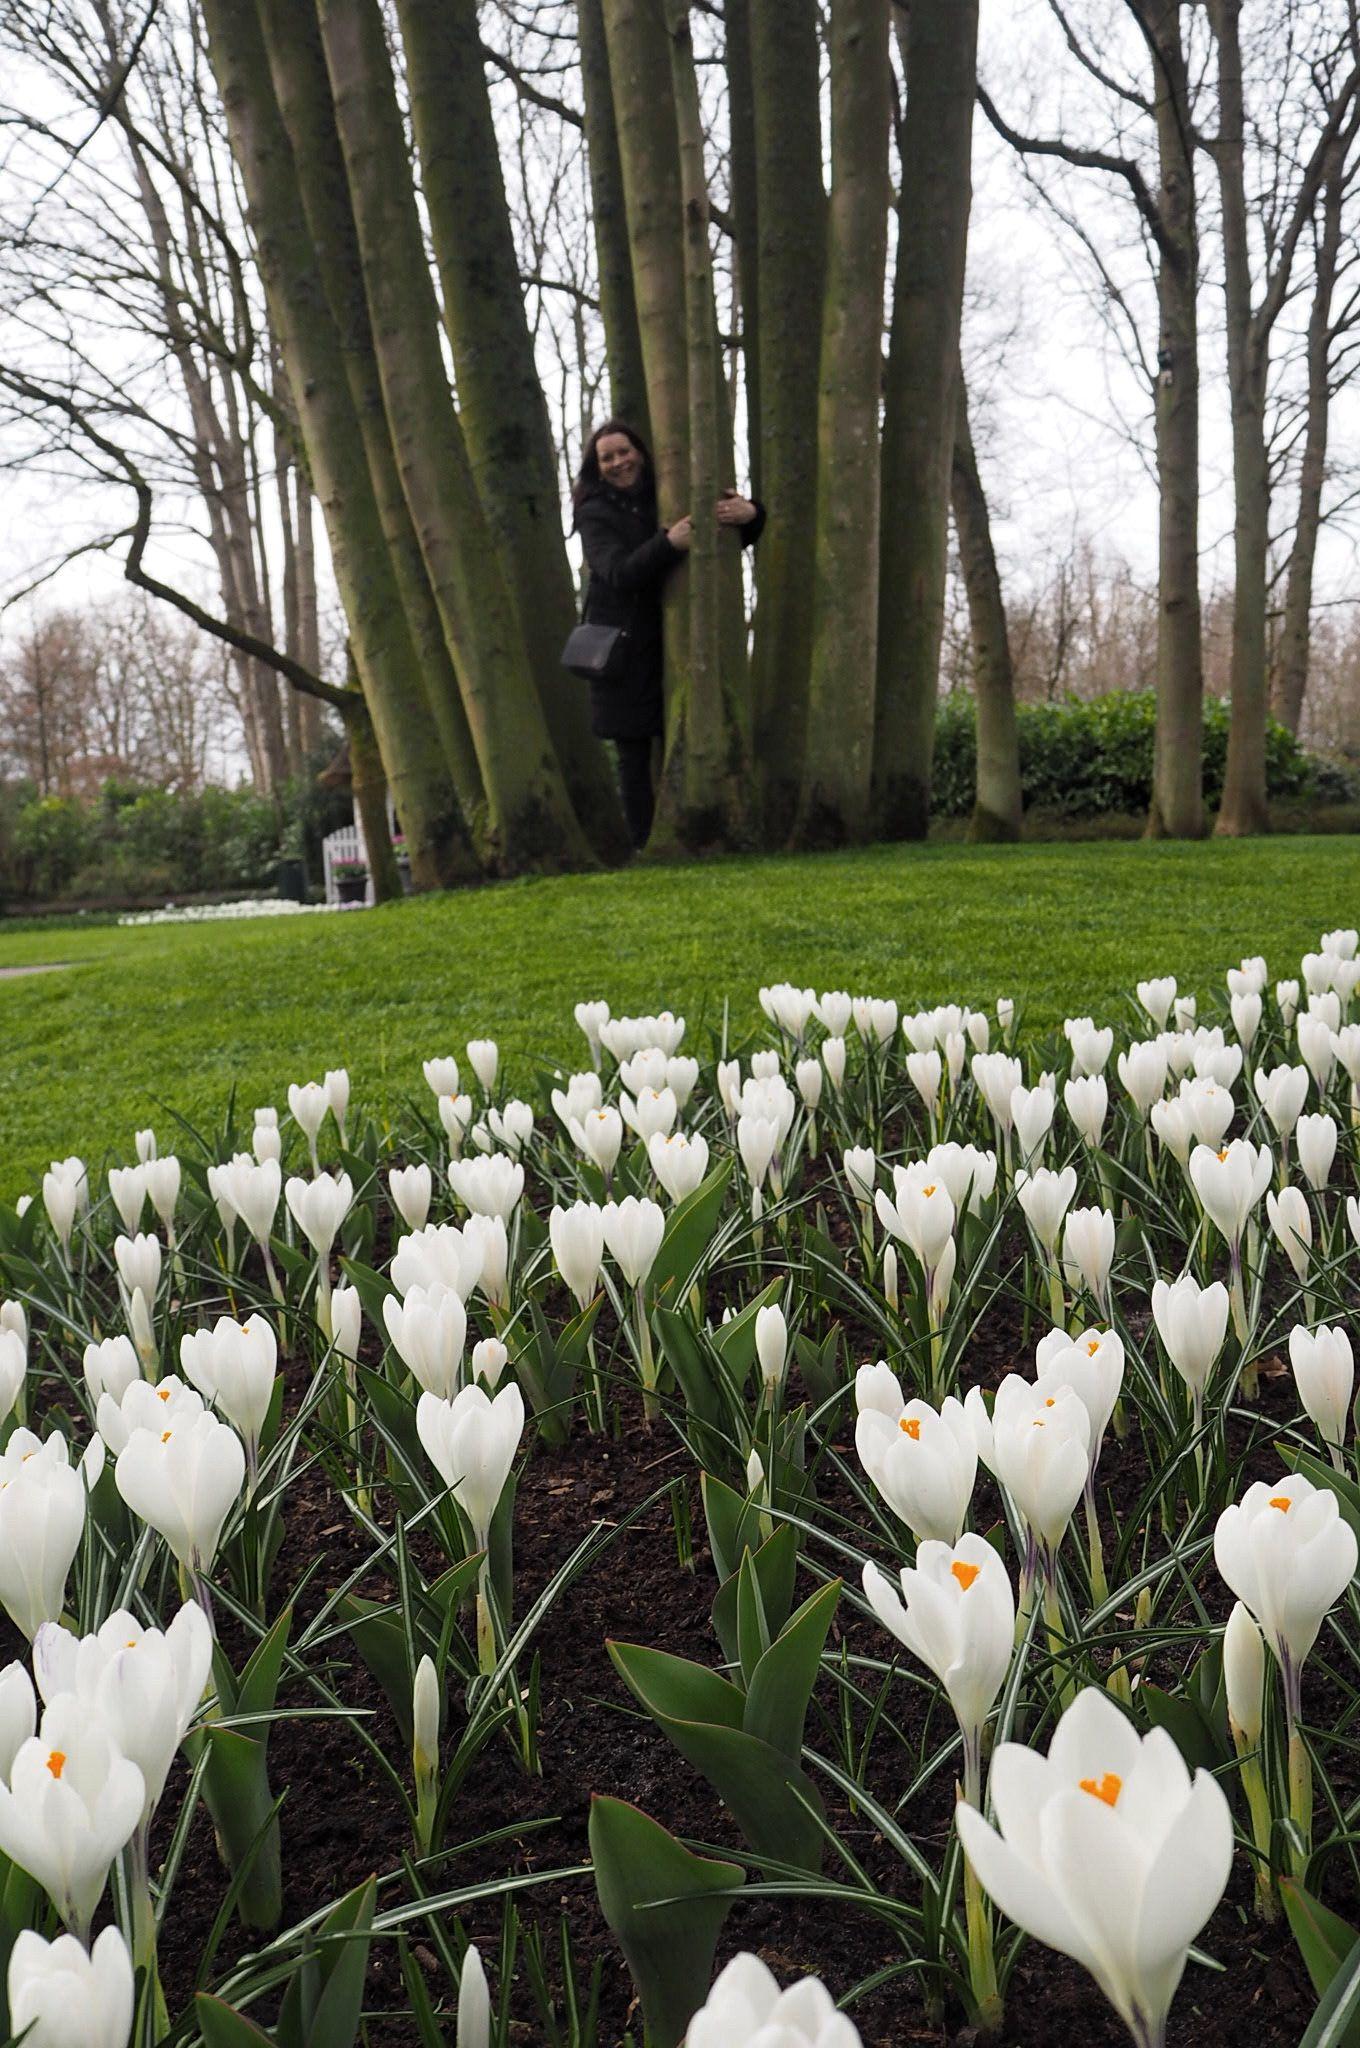 At one with nature at Keukenhof Tulip Gardens